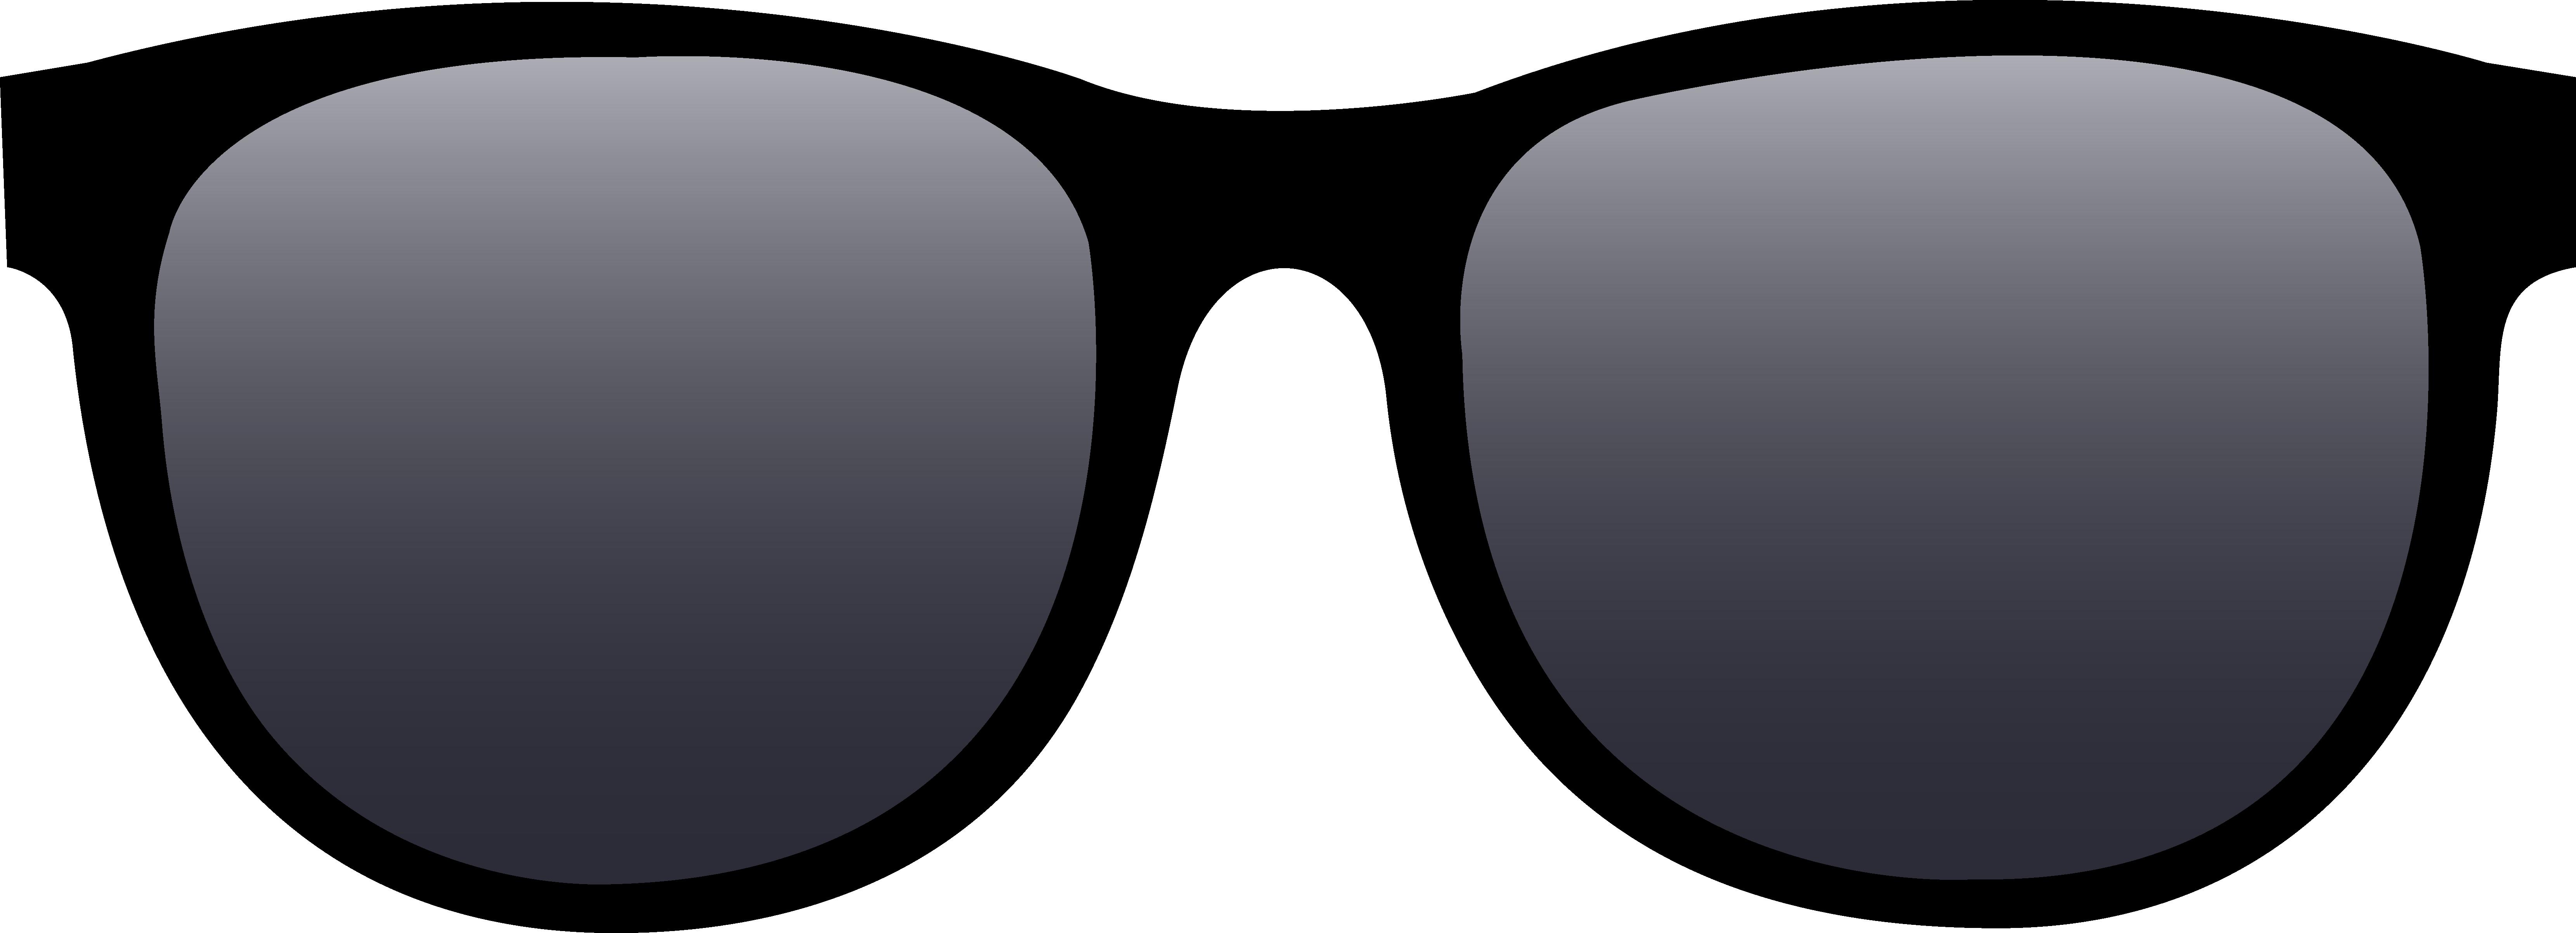 image free Drawing sun glasses free image